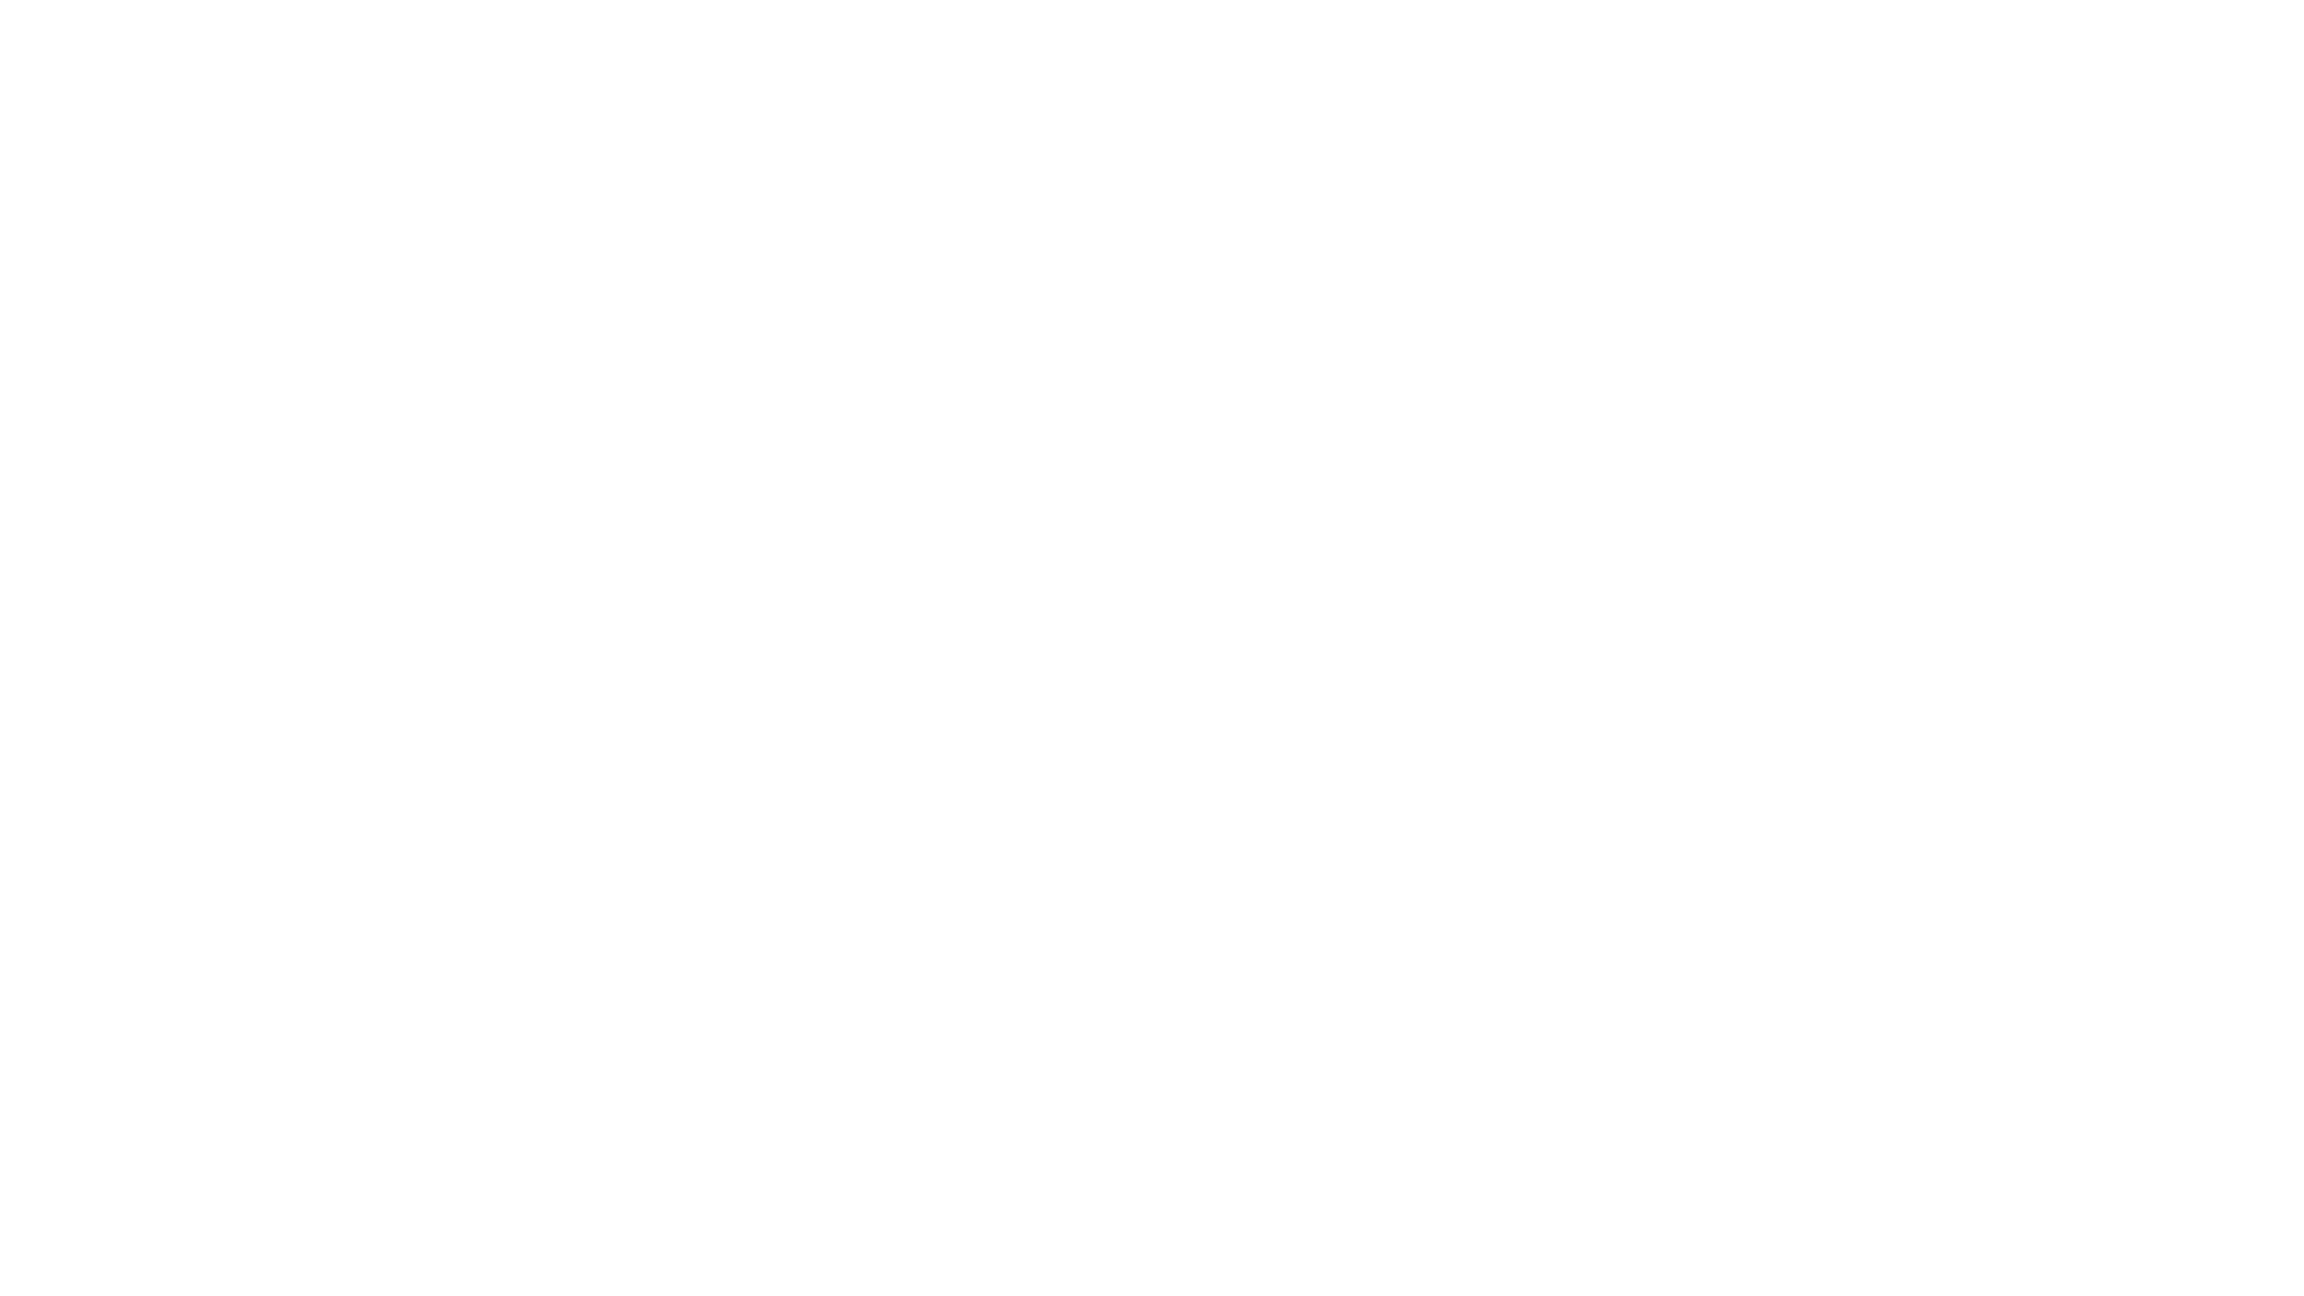 Webcam Cala Ratjada Agulla